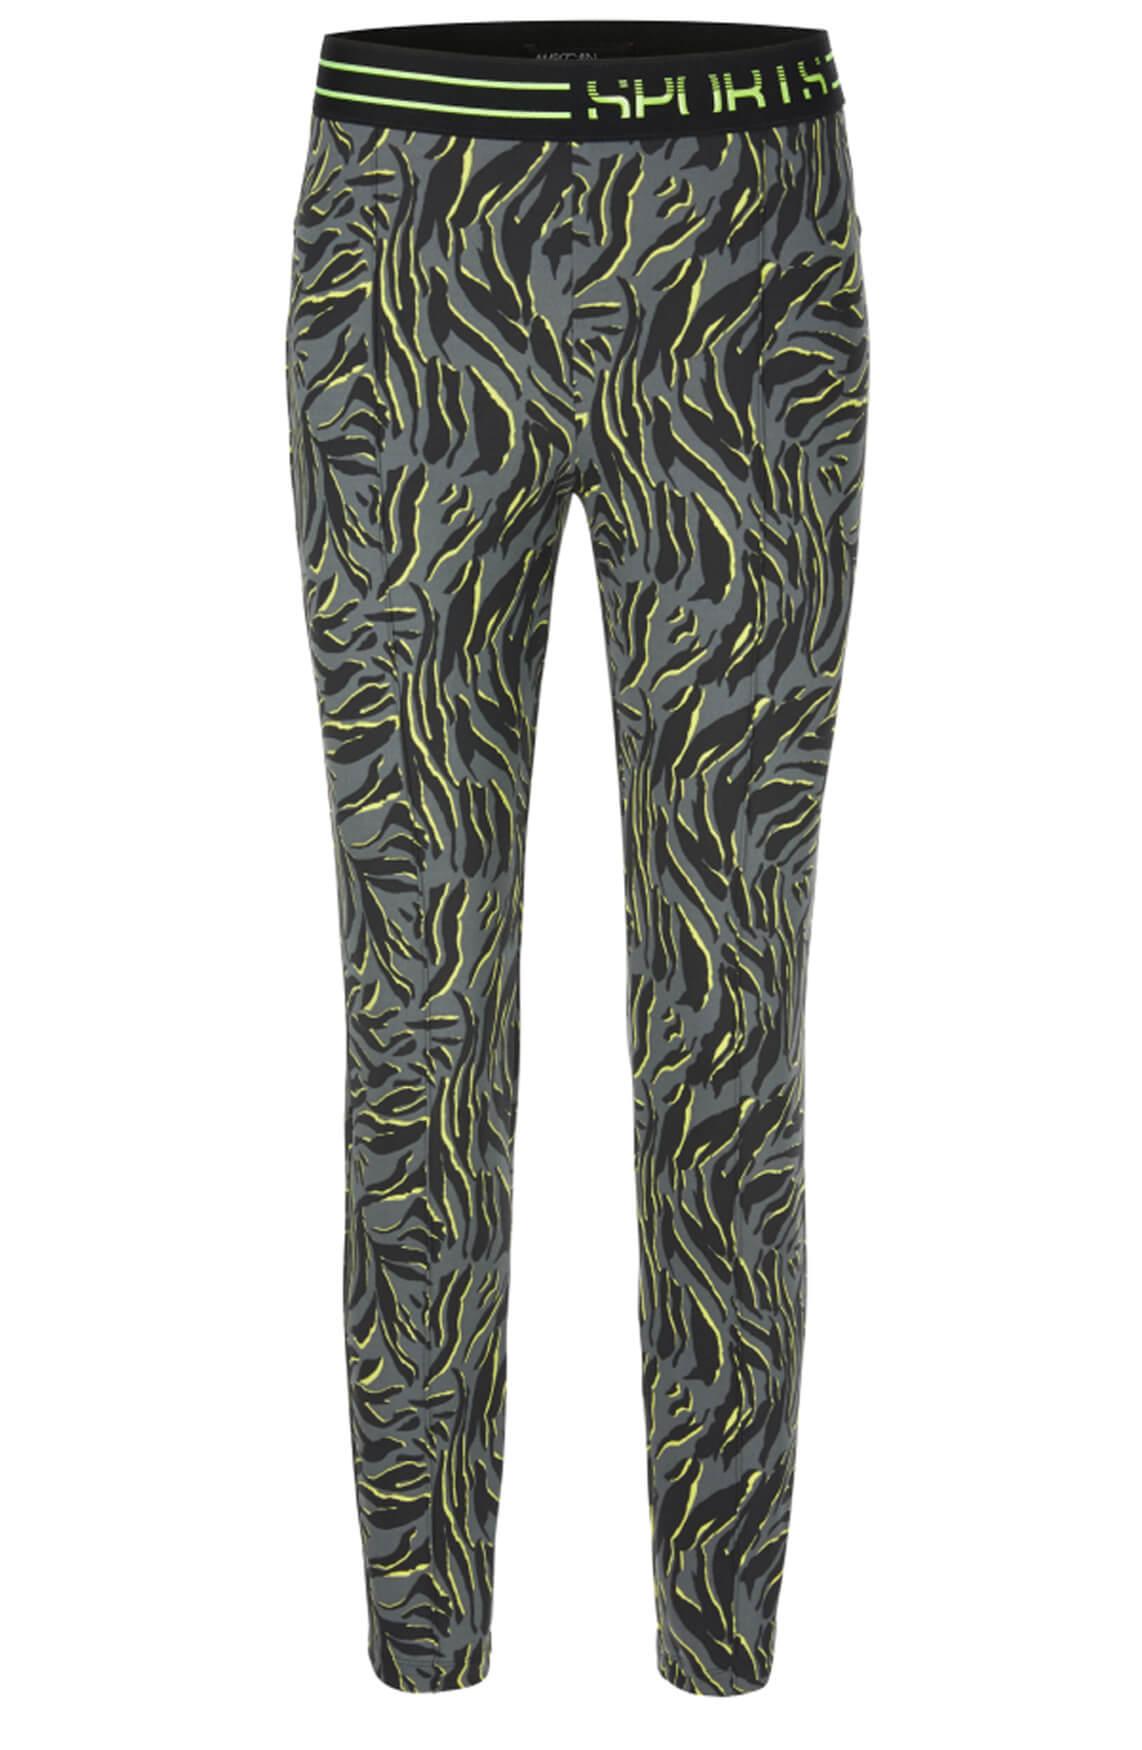 Marccain Sports Dames Pantalon met zebraprint Grijs